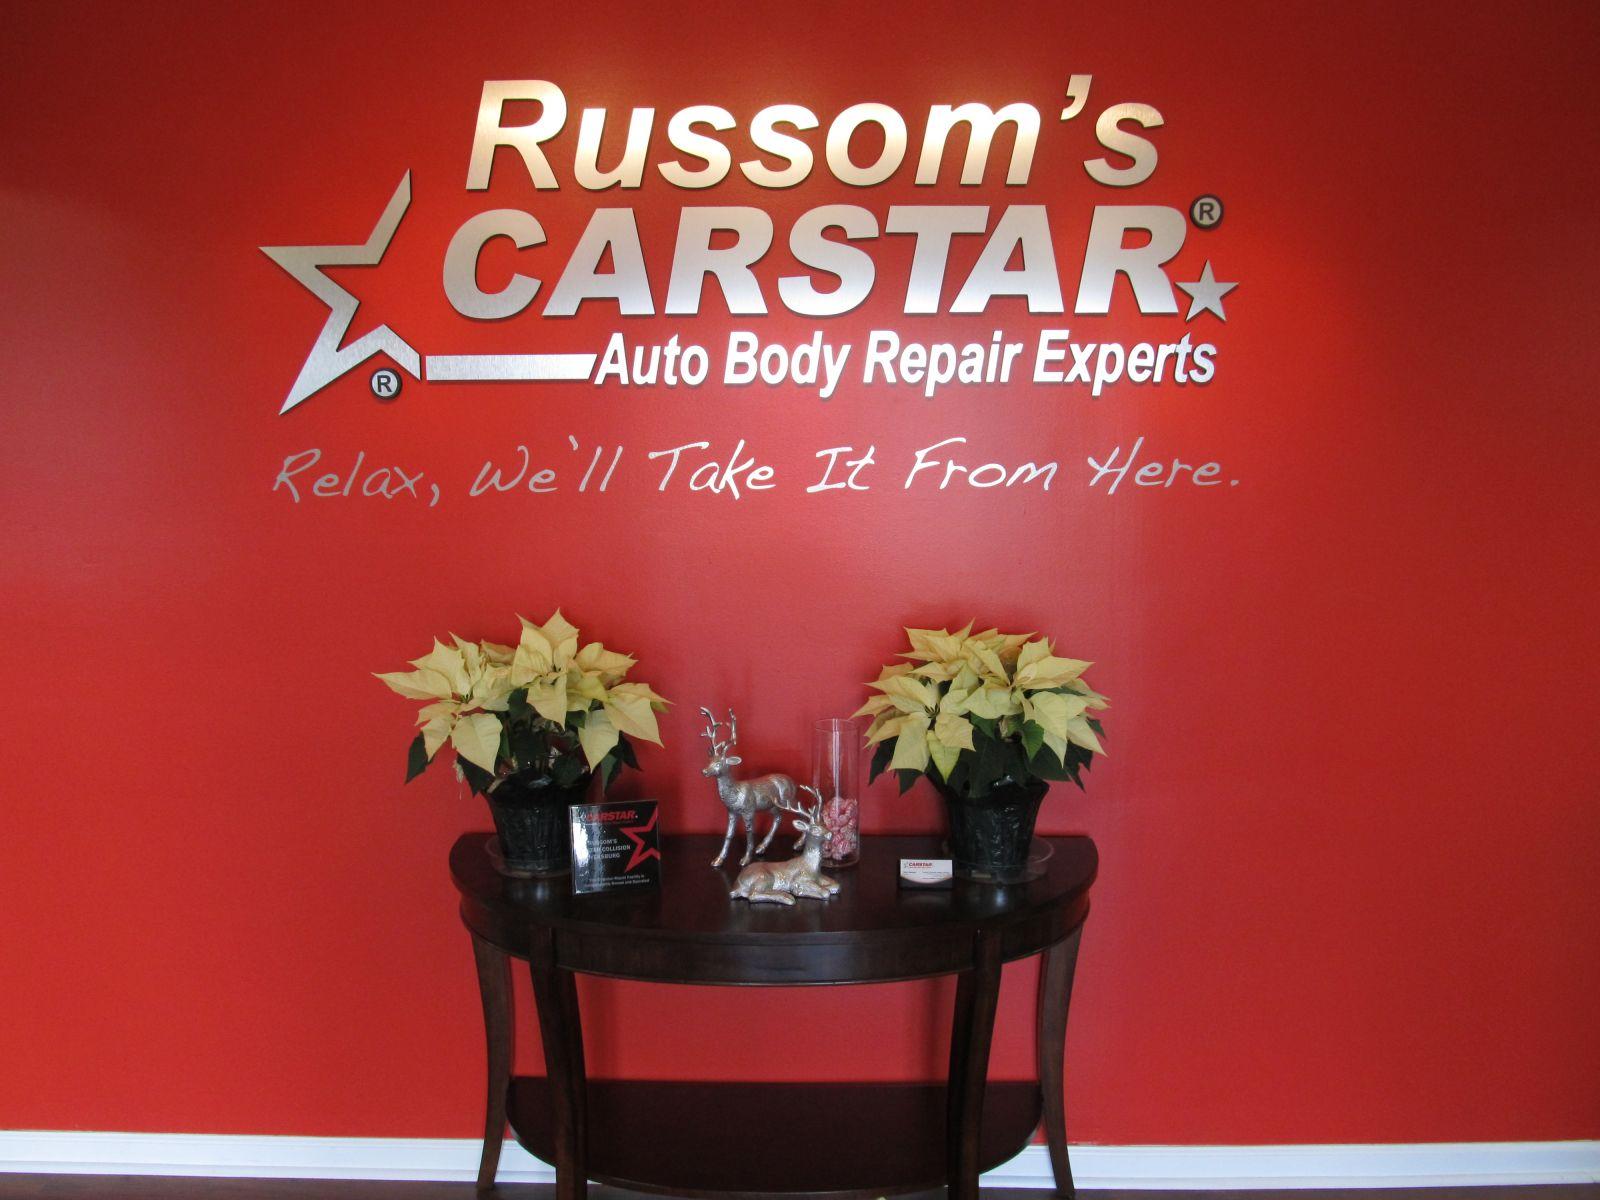 Carstar | Russom's CARSTAR: Front Office